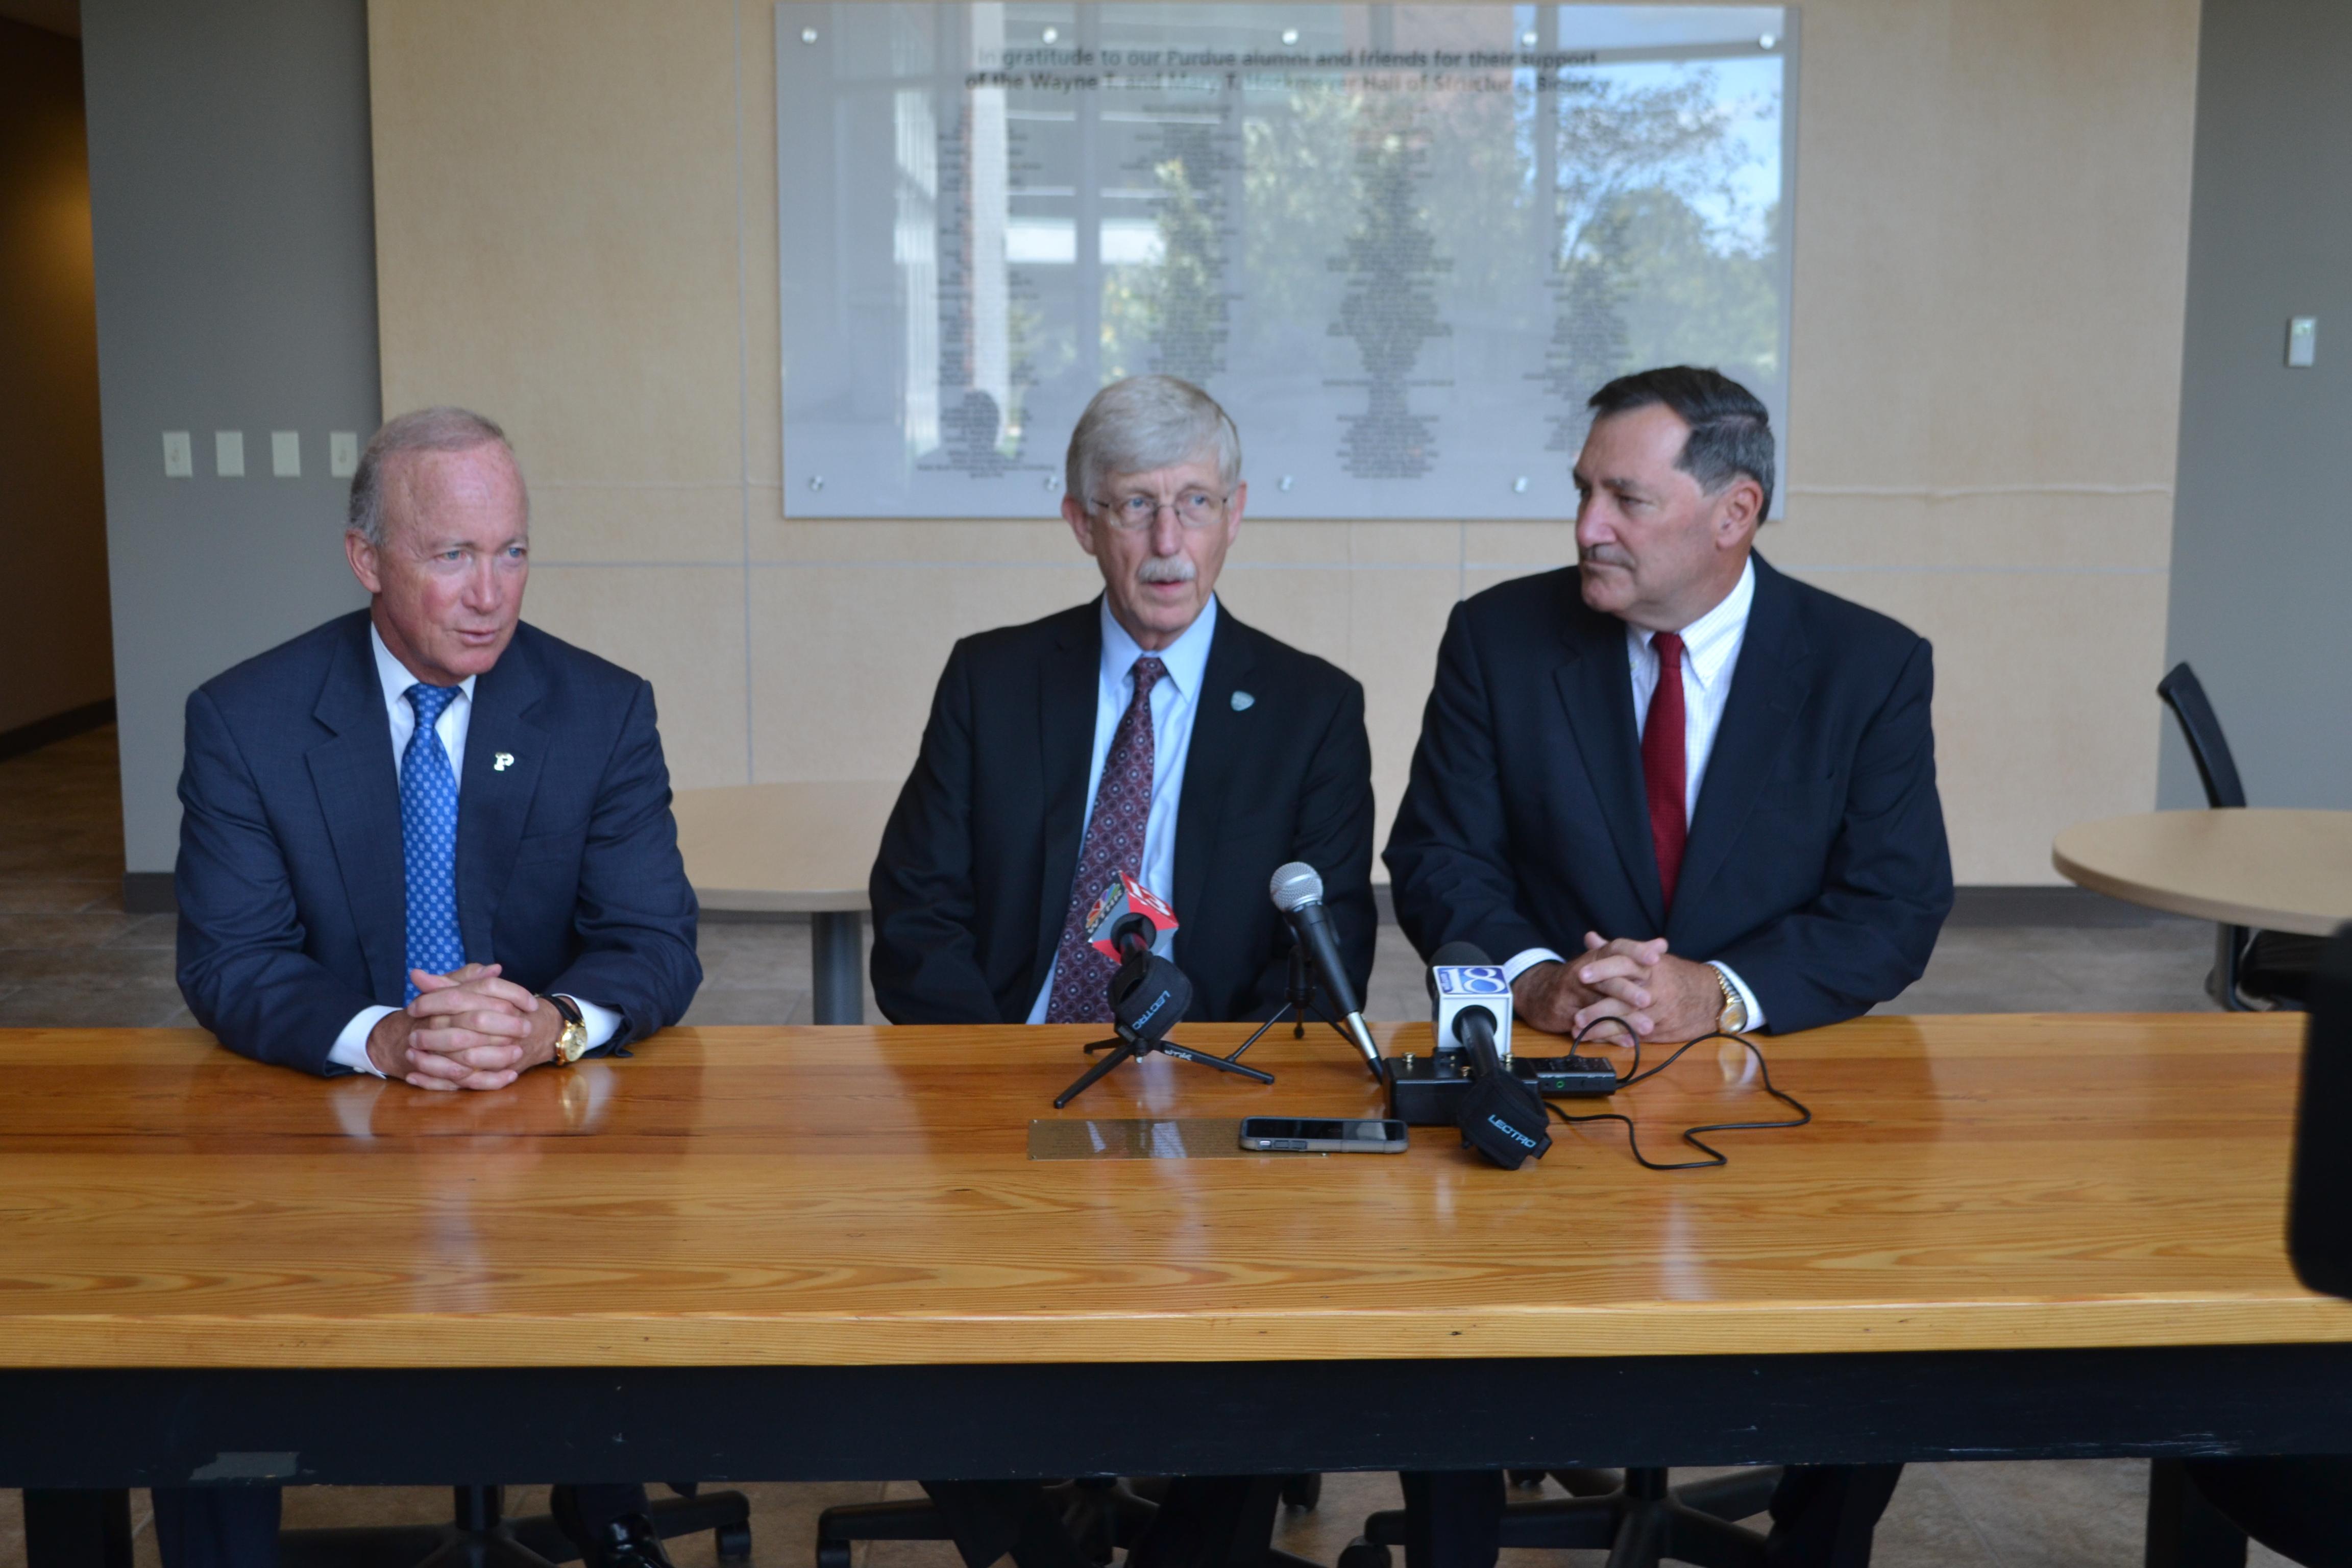 Donnelly, Daniels, NIH Director Collins Discuss Purdue's